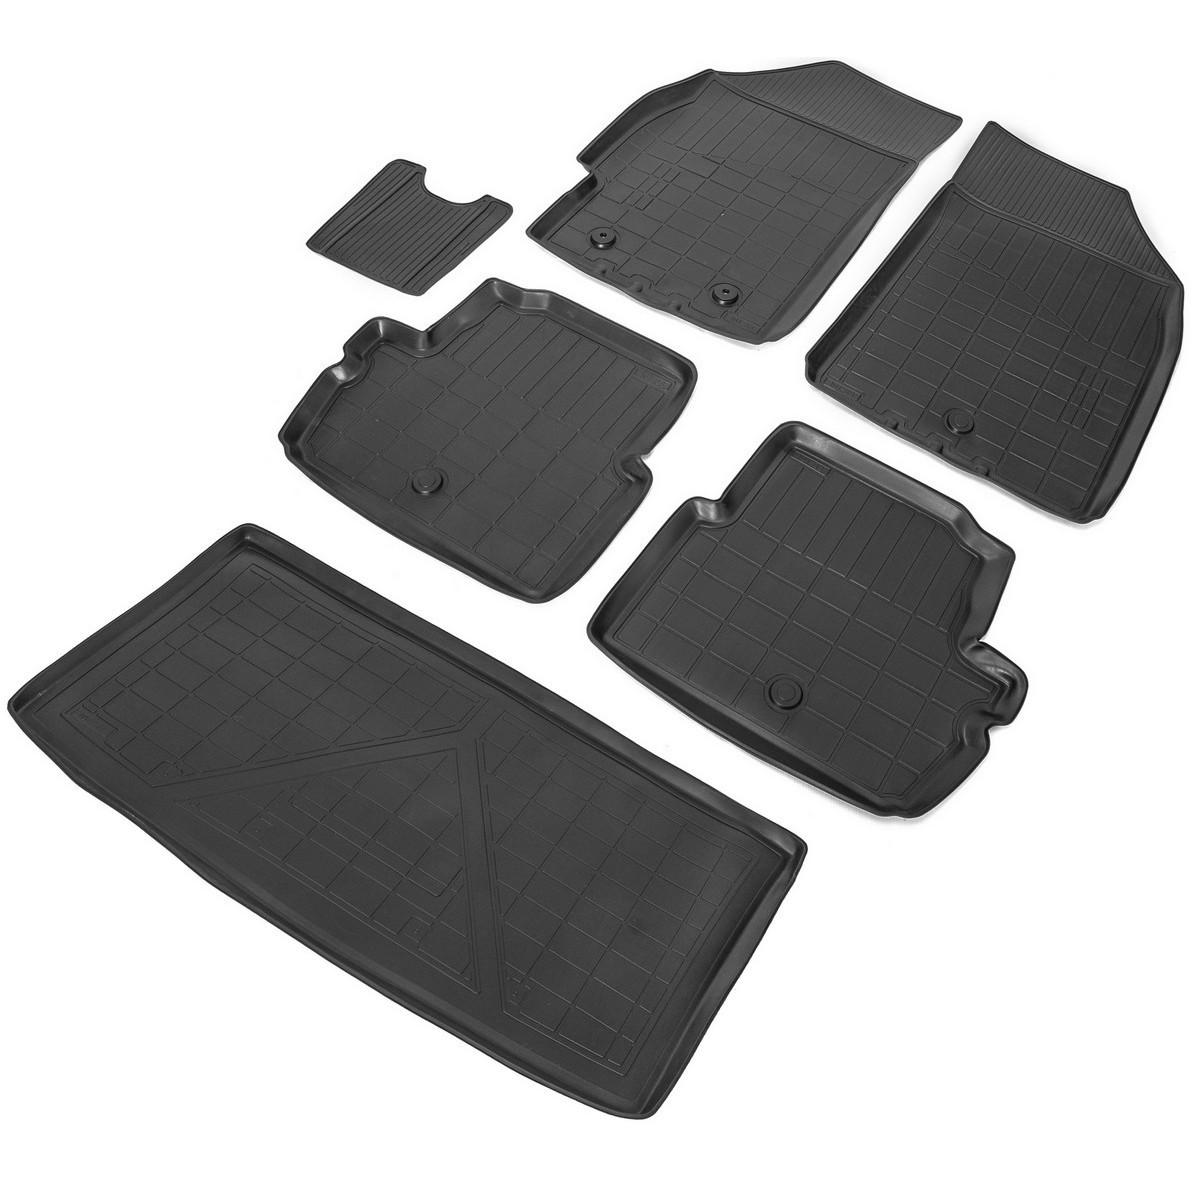 Комплект ковриков салона и багажника Rival Chevrolet Spark III хэтчбек /Ravon R2 хэтчбек,